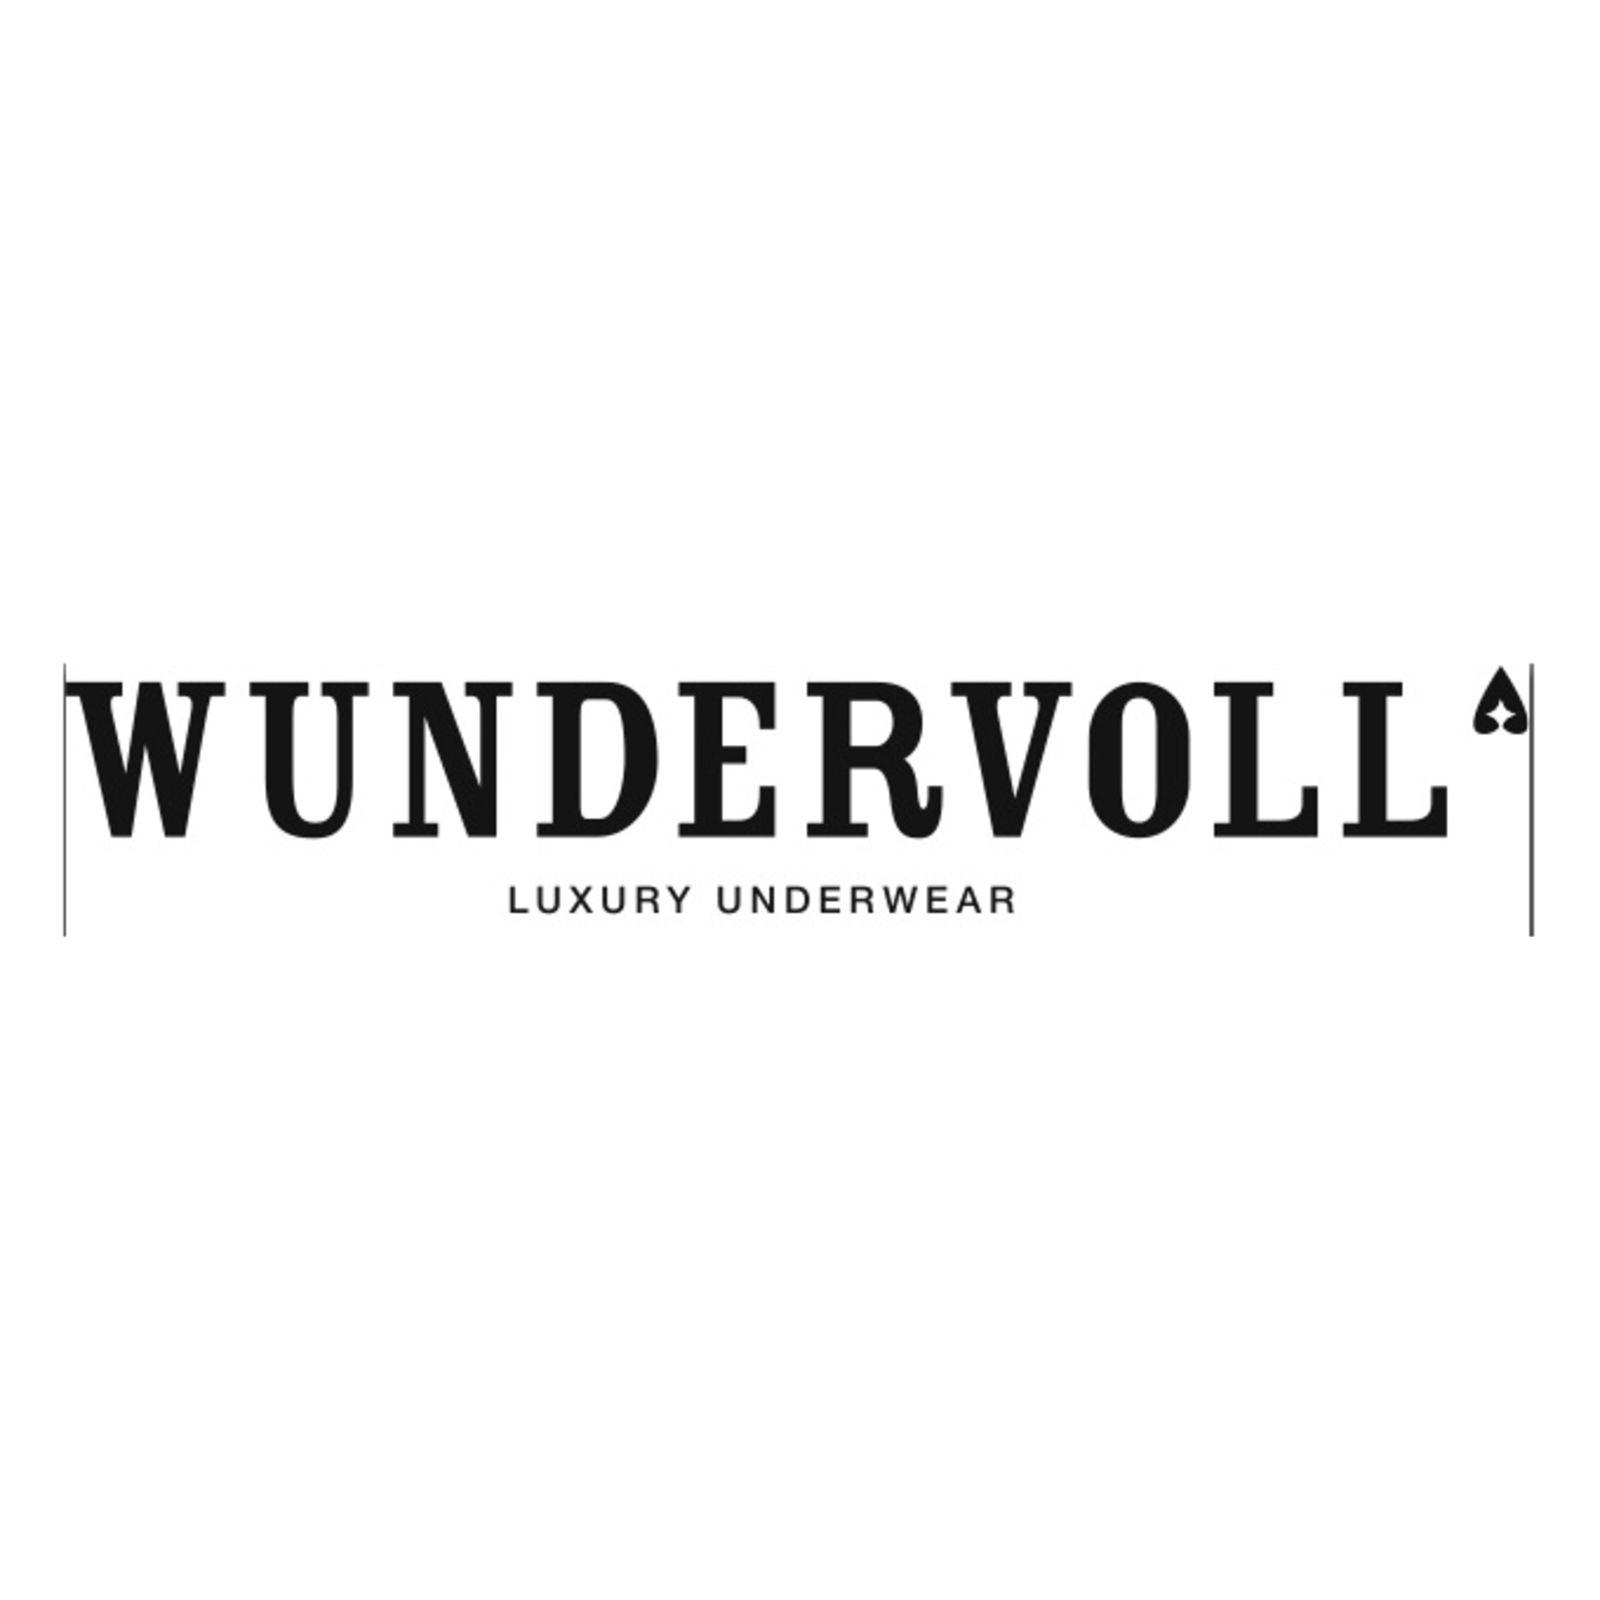 WUNDERVOLL